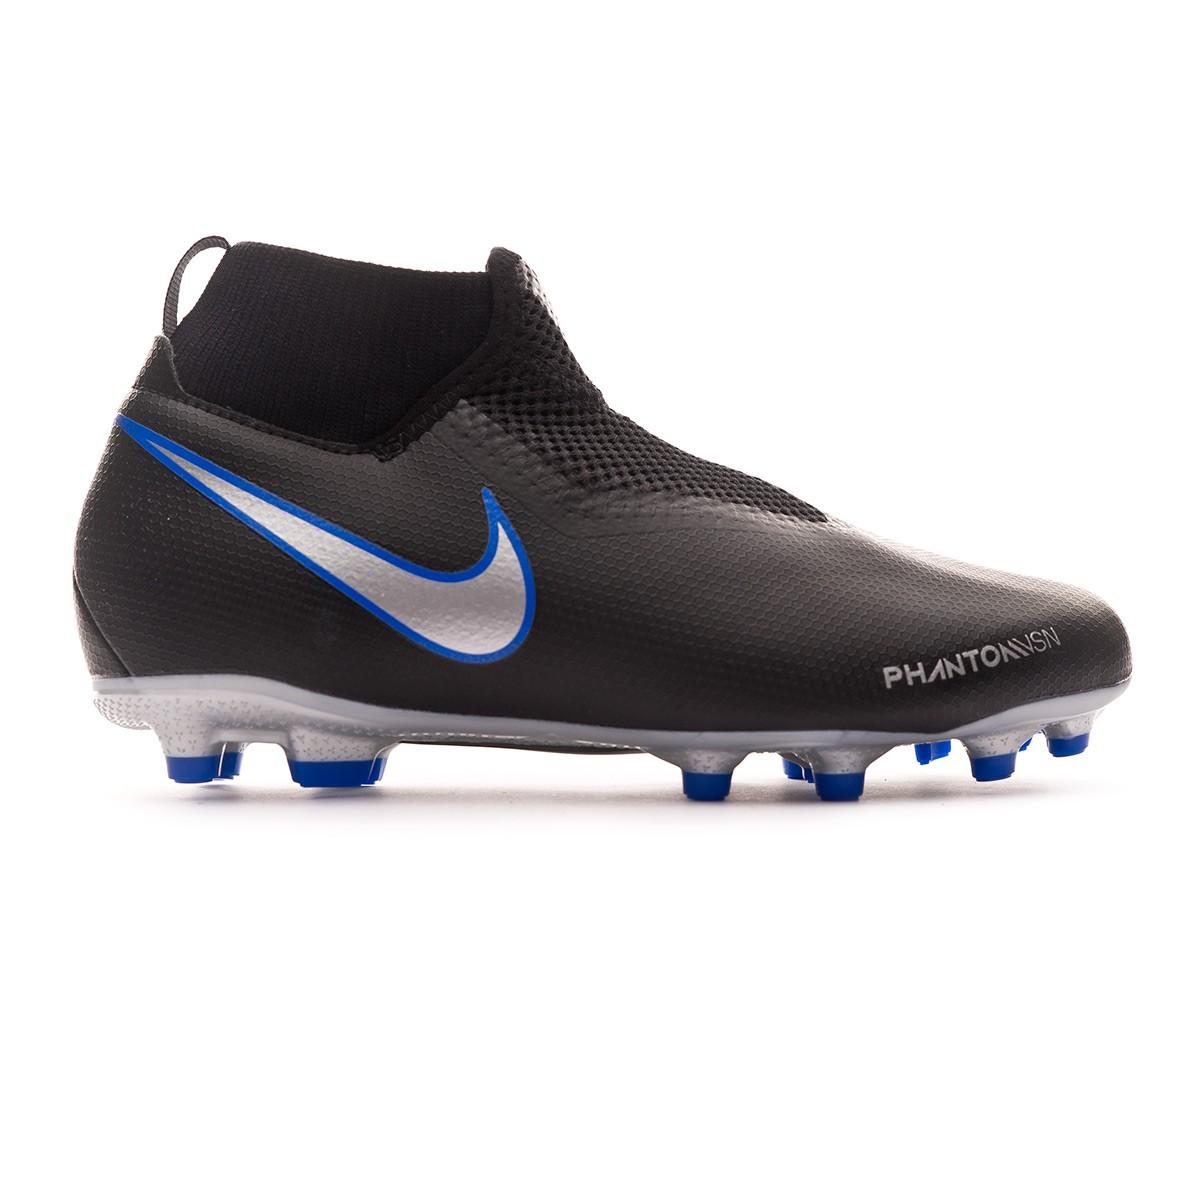 3951616e5733b Football Boots Nike Phantom Vision Academy DF FG MG Niño Black-Metallic  silver-Racer blue - Tienda de fútbol Fútbol Emotion